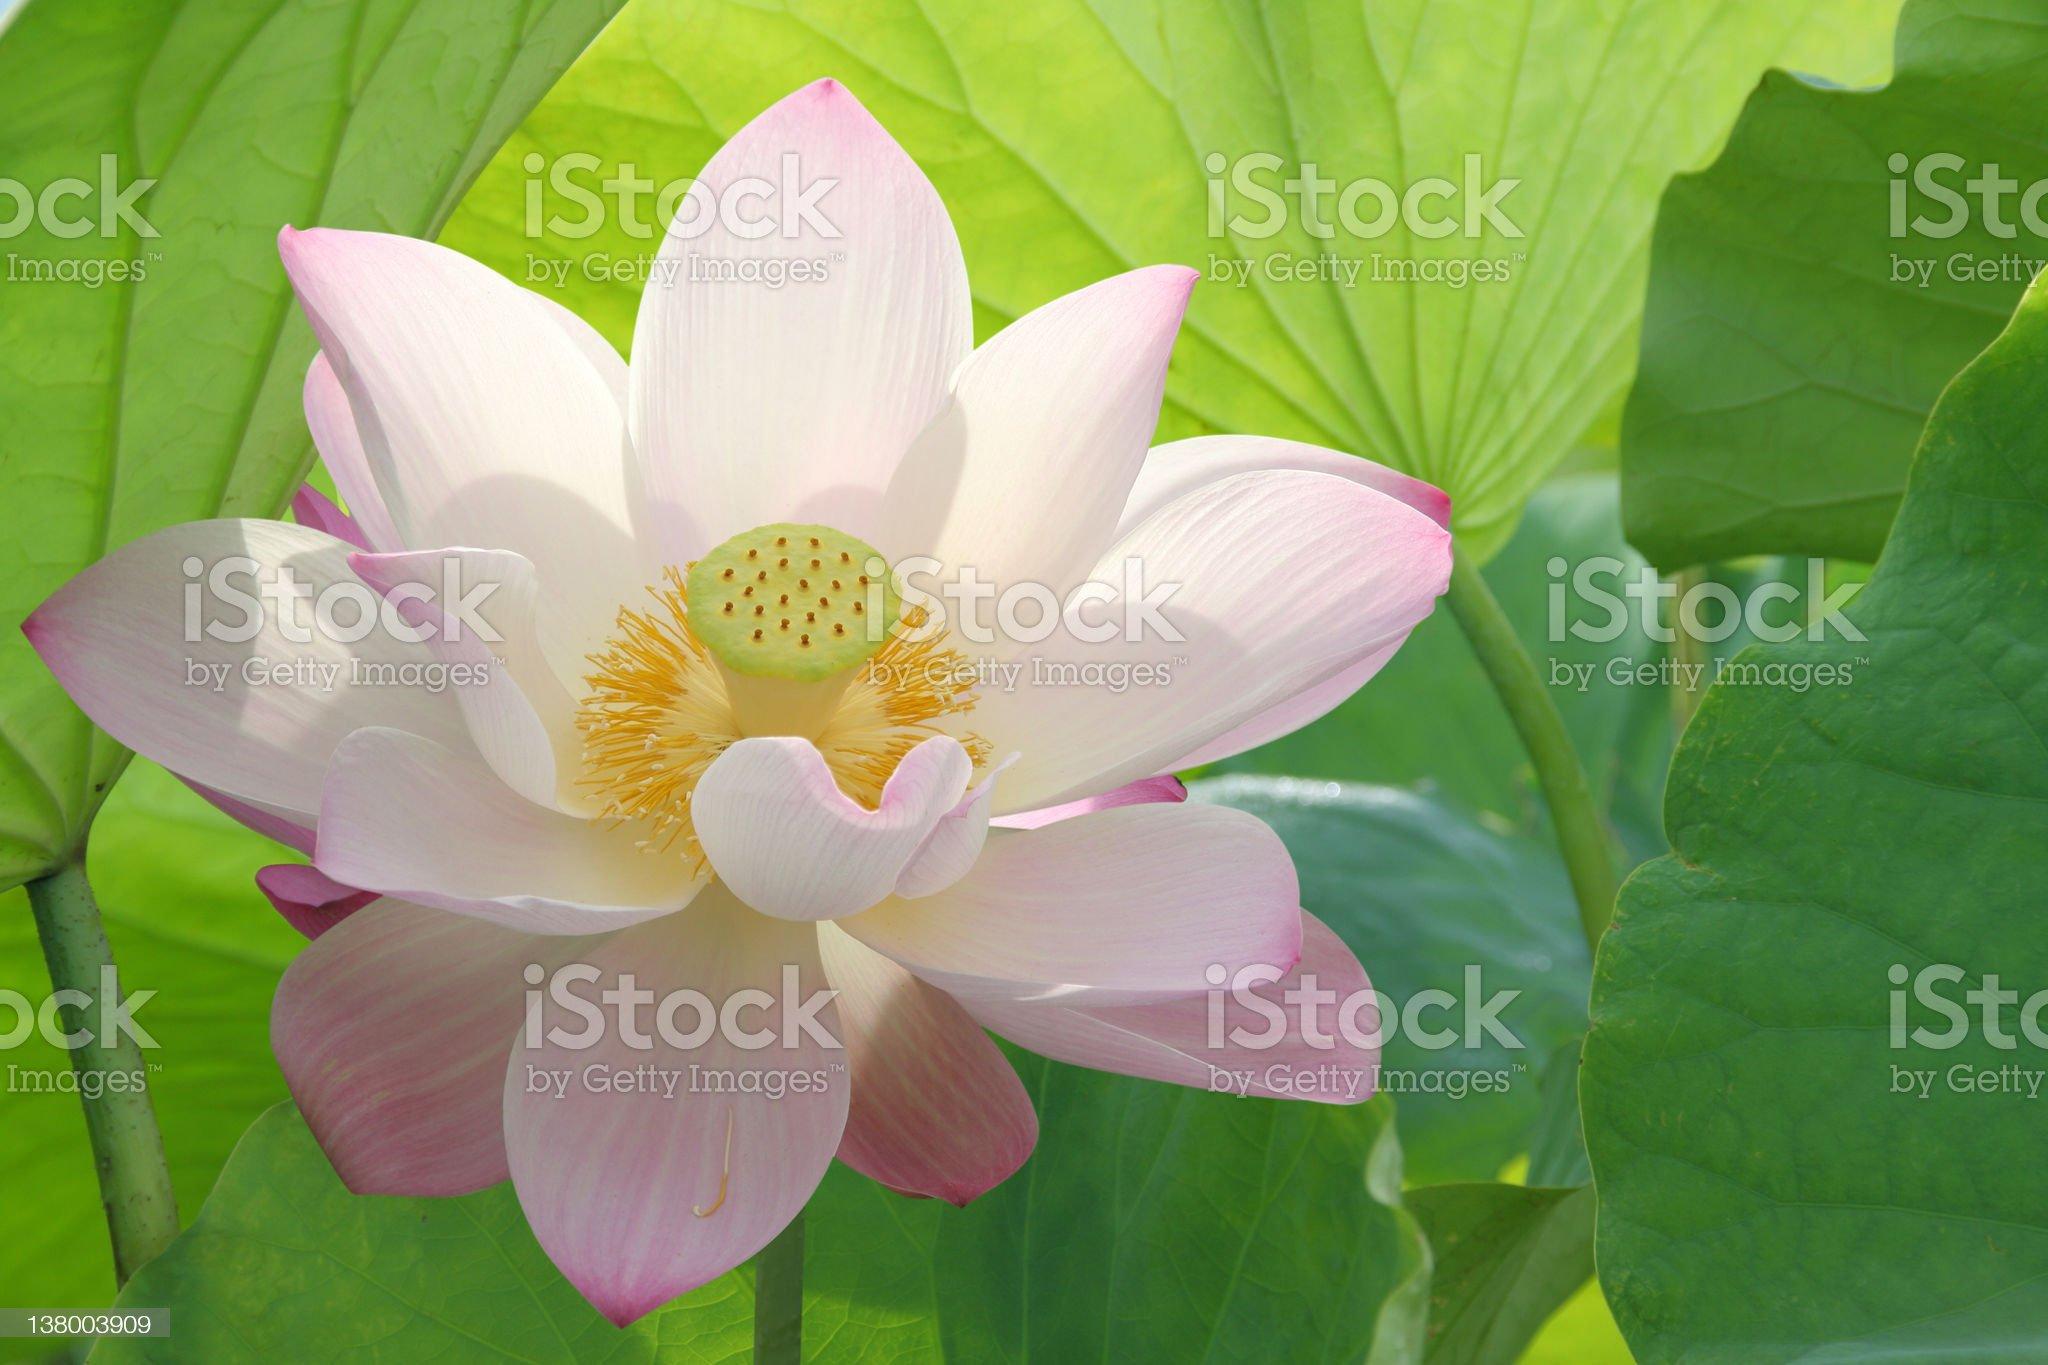 lotus flower blossom royalty-free stock photo